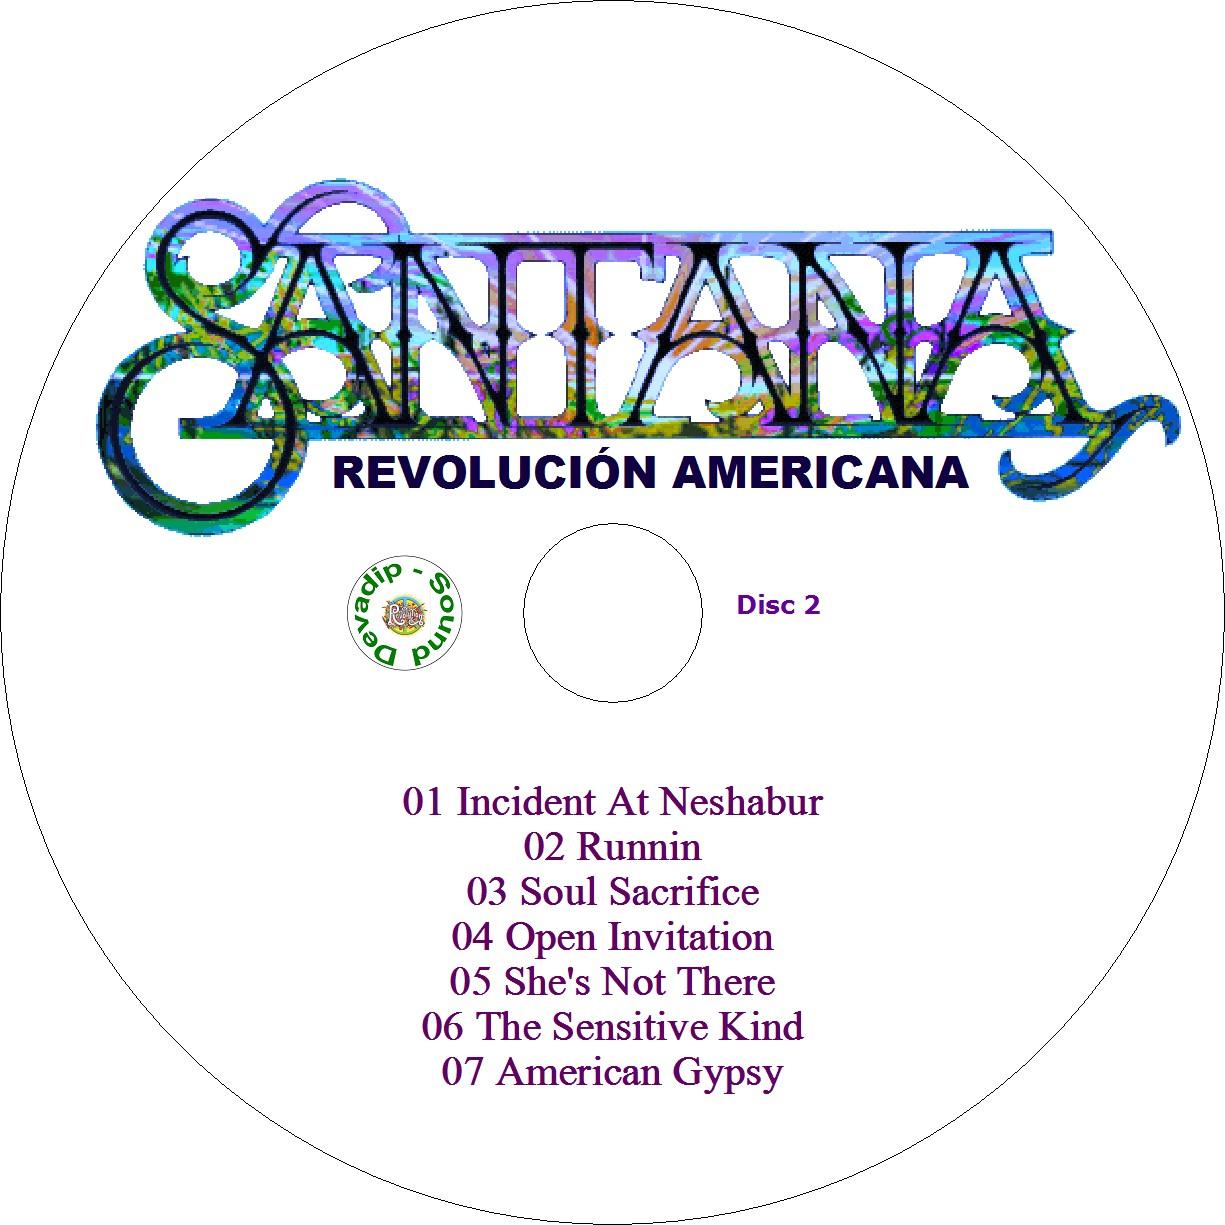 Carlos Santana Soundboard